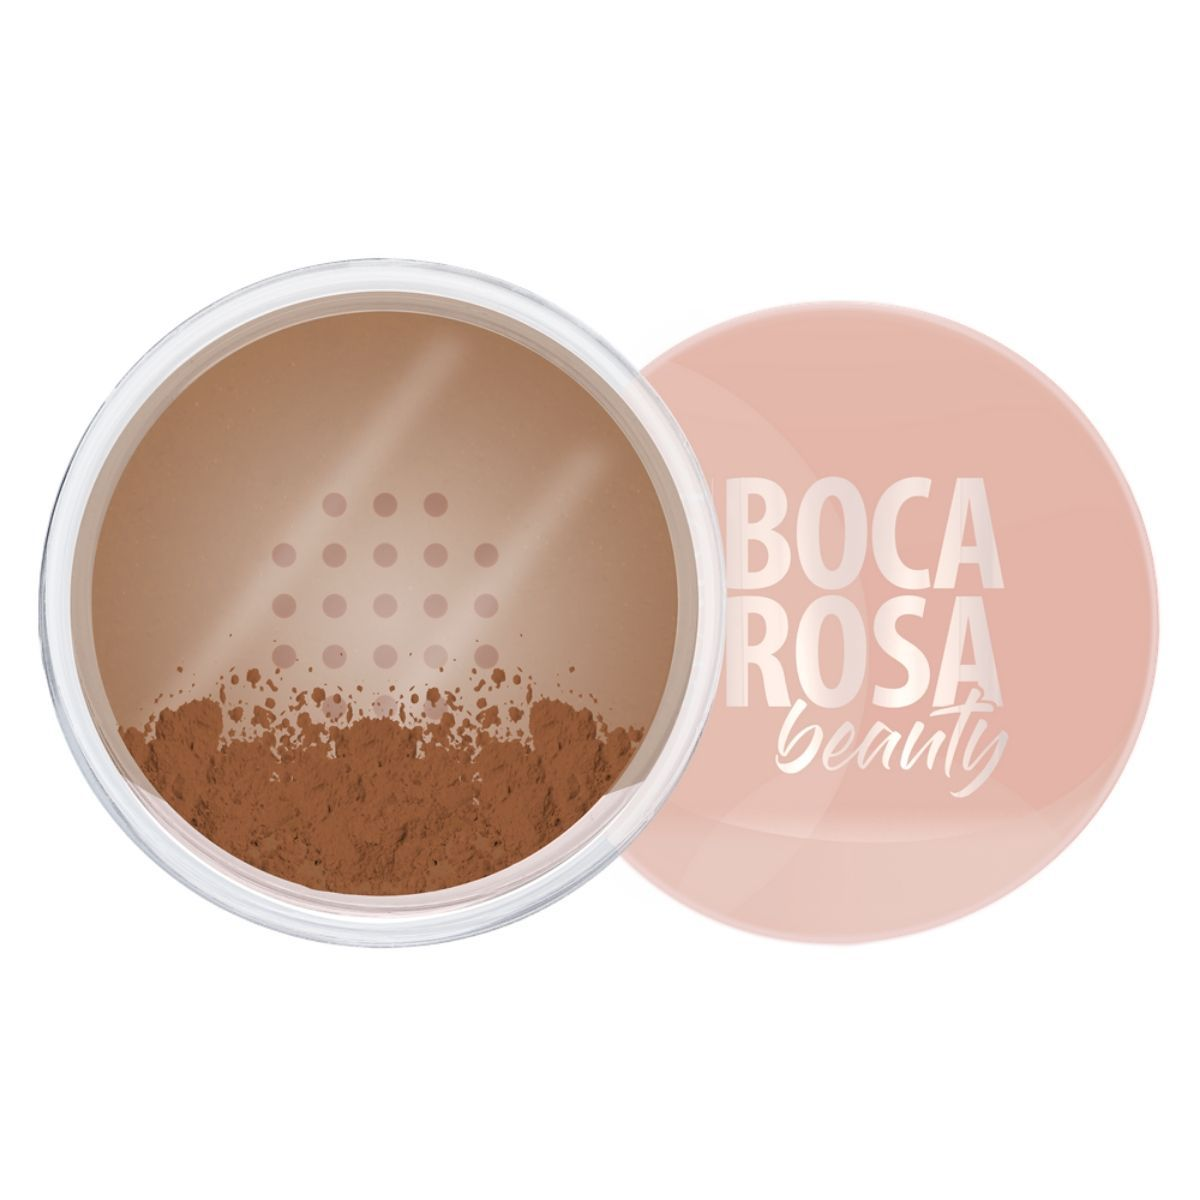 Pó Facial Solto Boca Rosa Beauty By Payot Mate - 3 - Mármore 20g